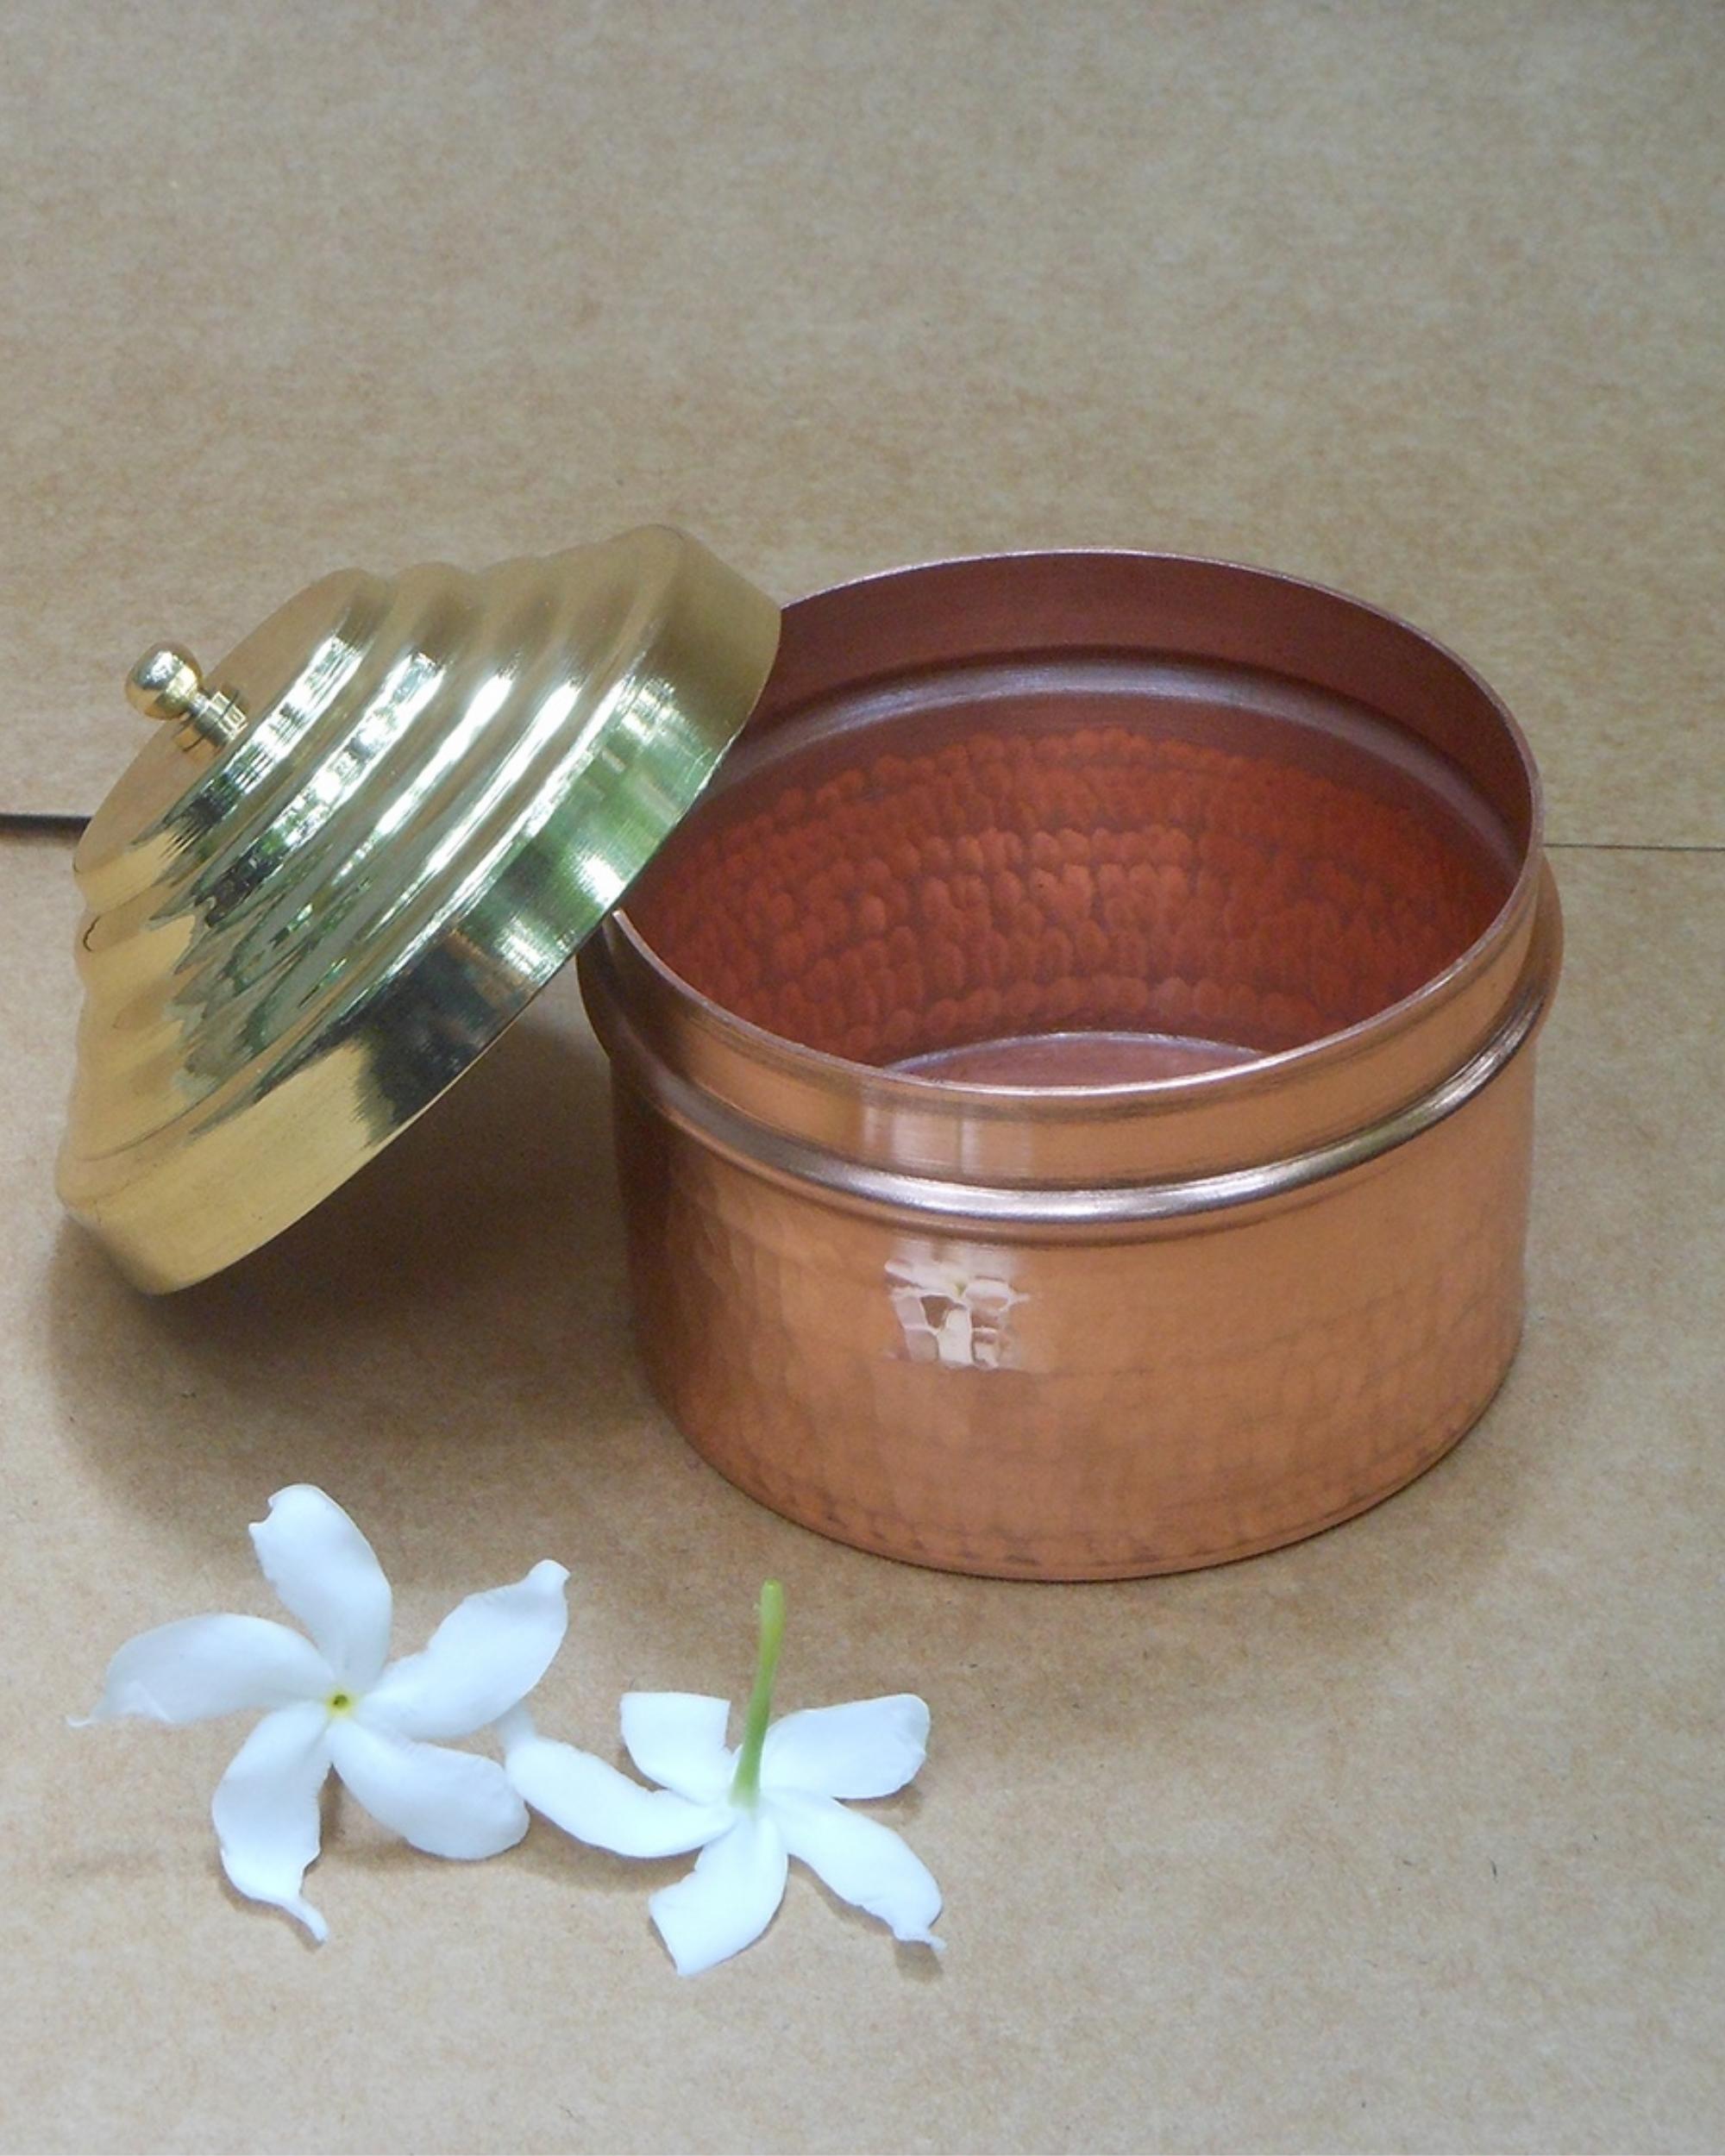 Heirloom copper box